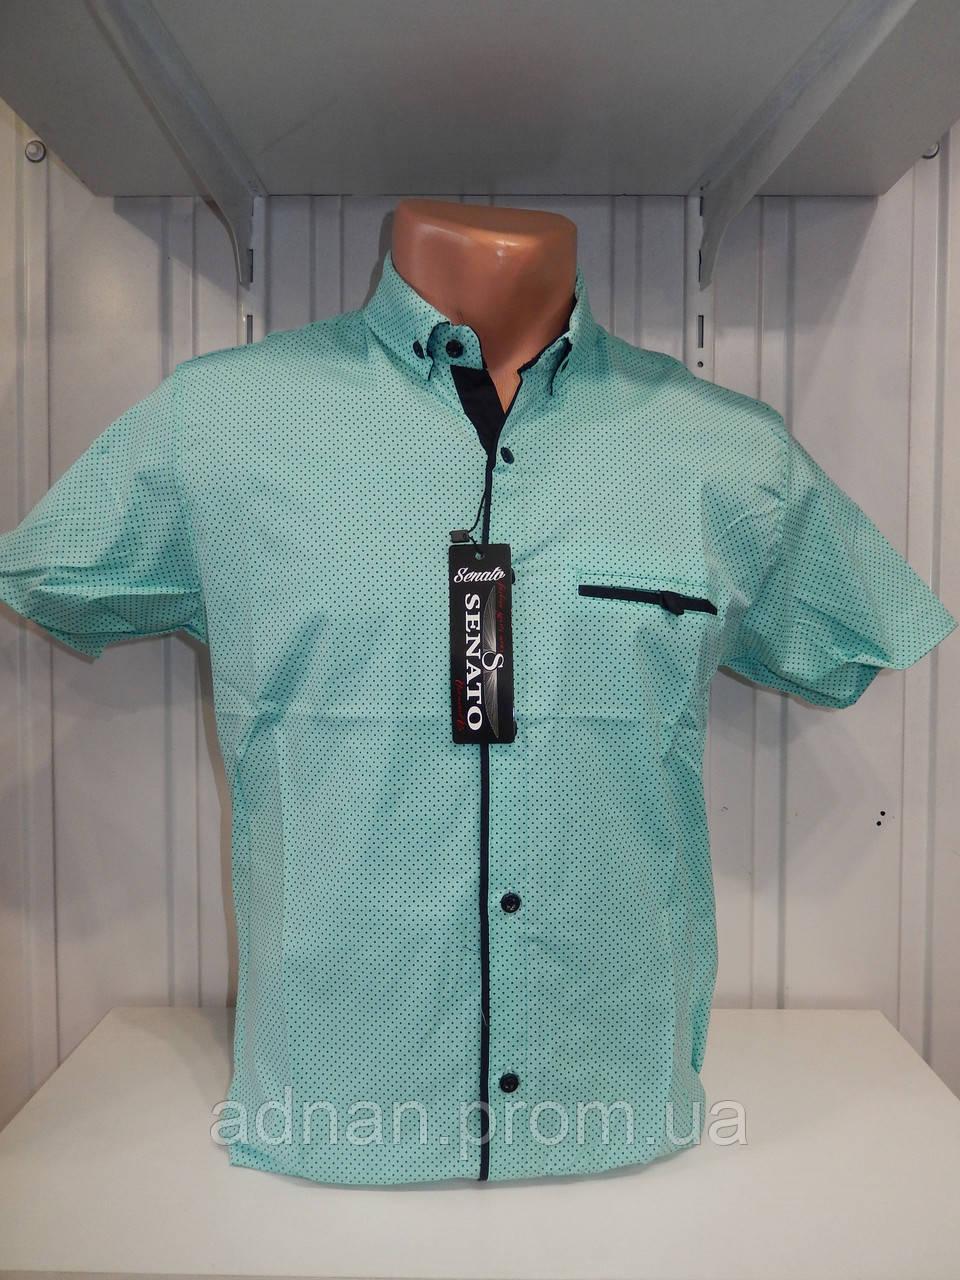 Рубашка мужская SENATO полу-батал, короткий рукав, узор, стрейч котон 18.06 001 \ купить рубашку оптом.